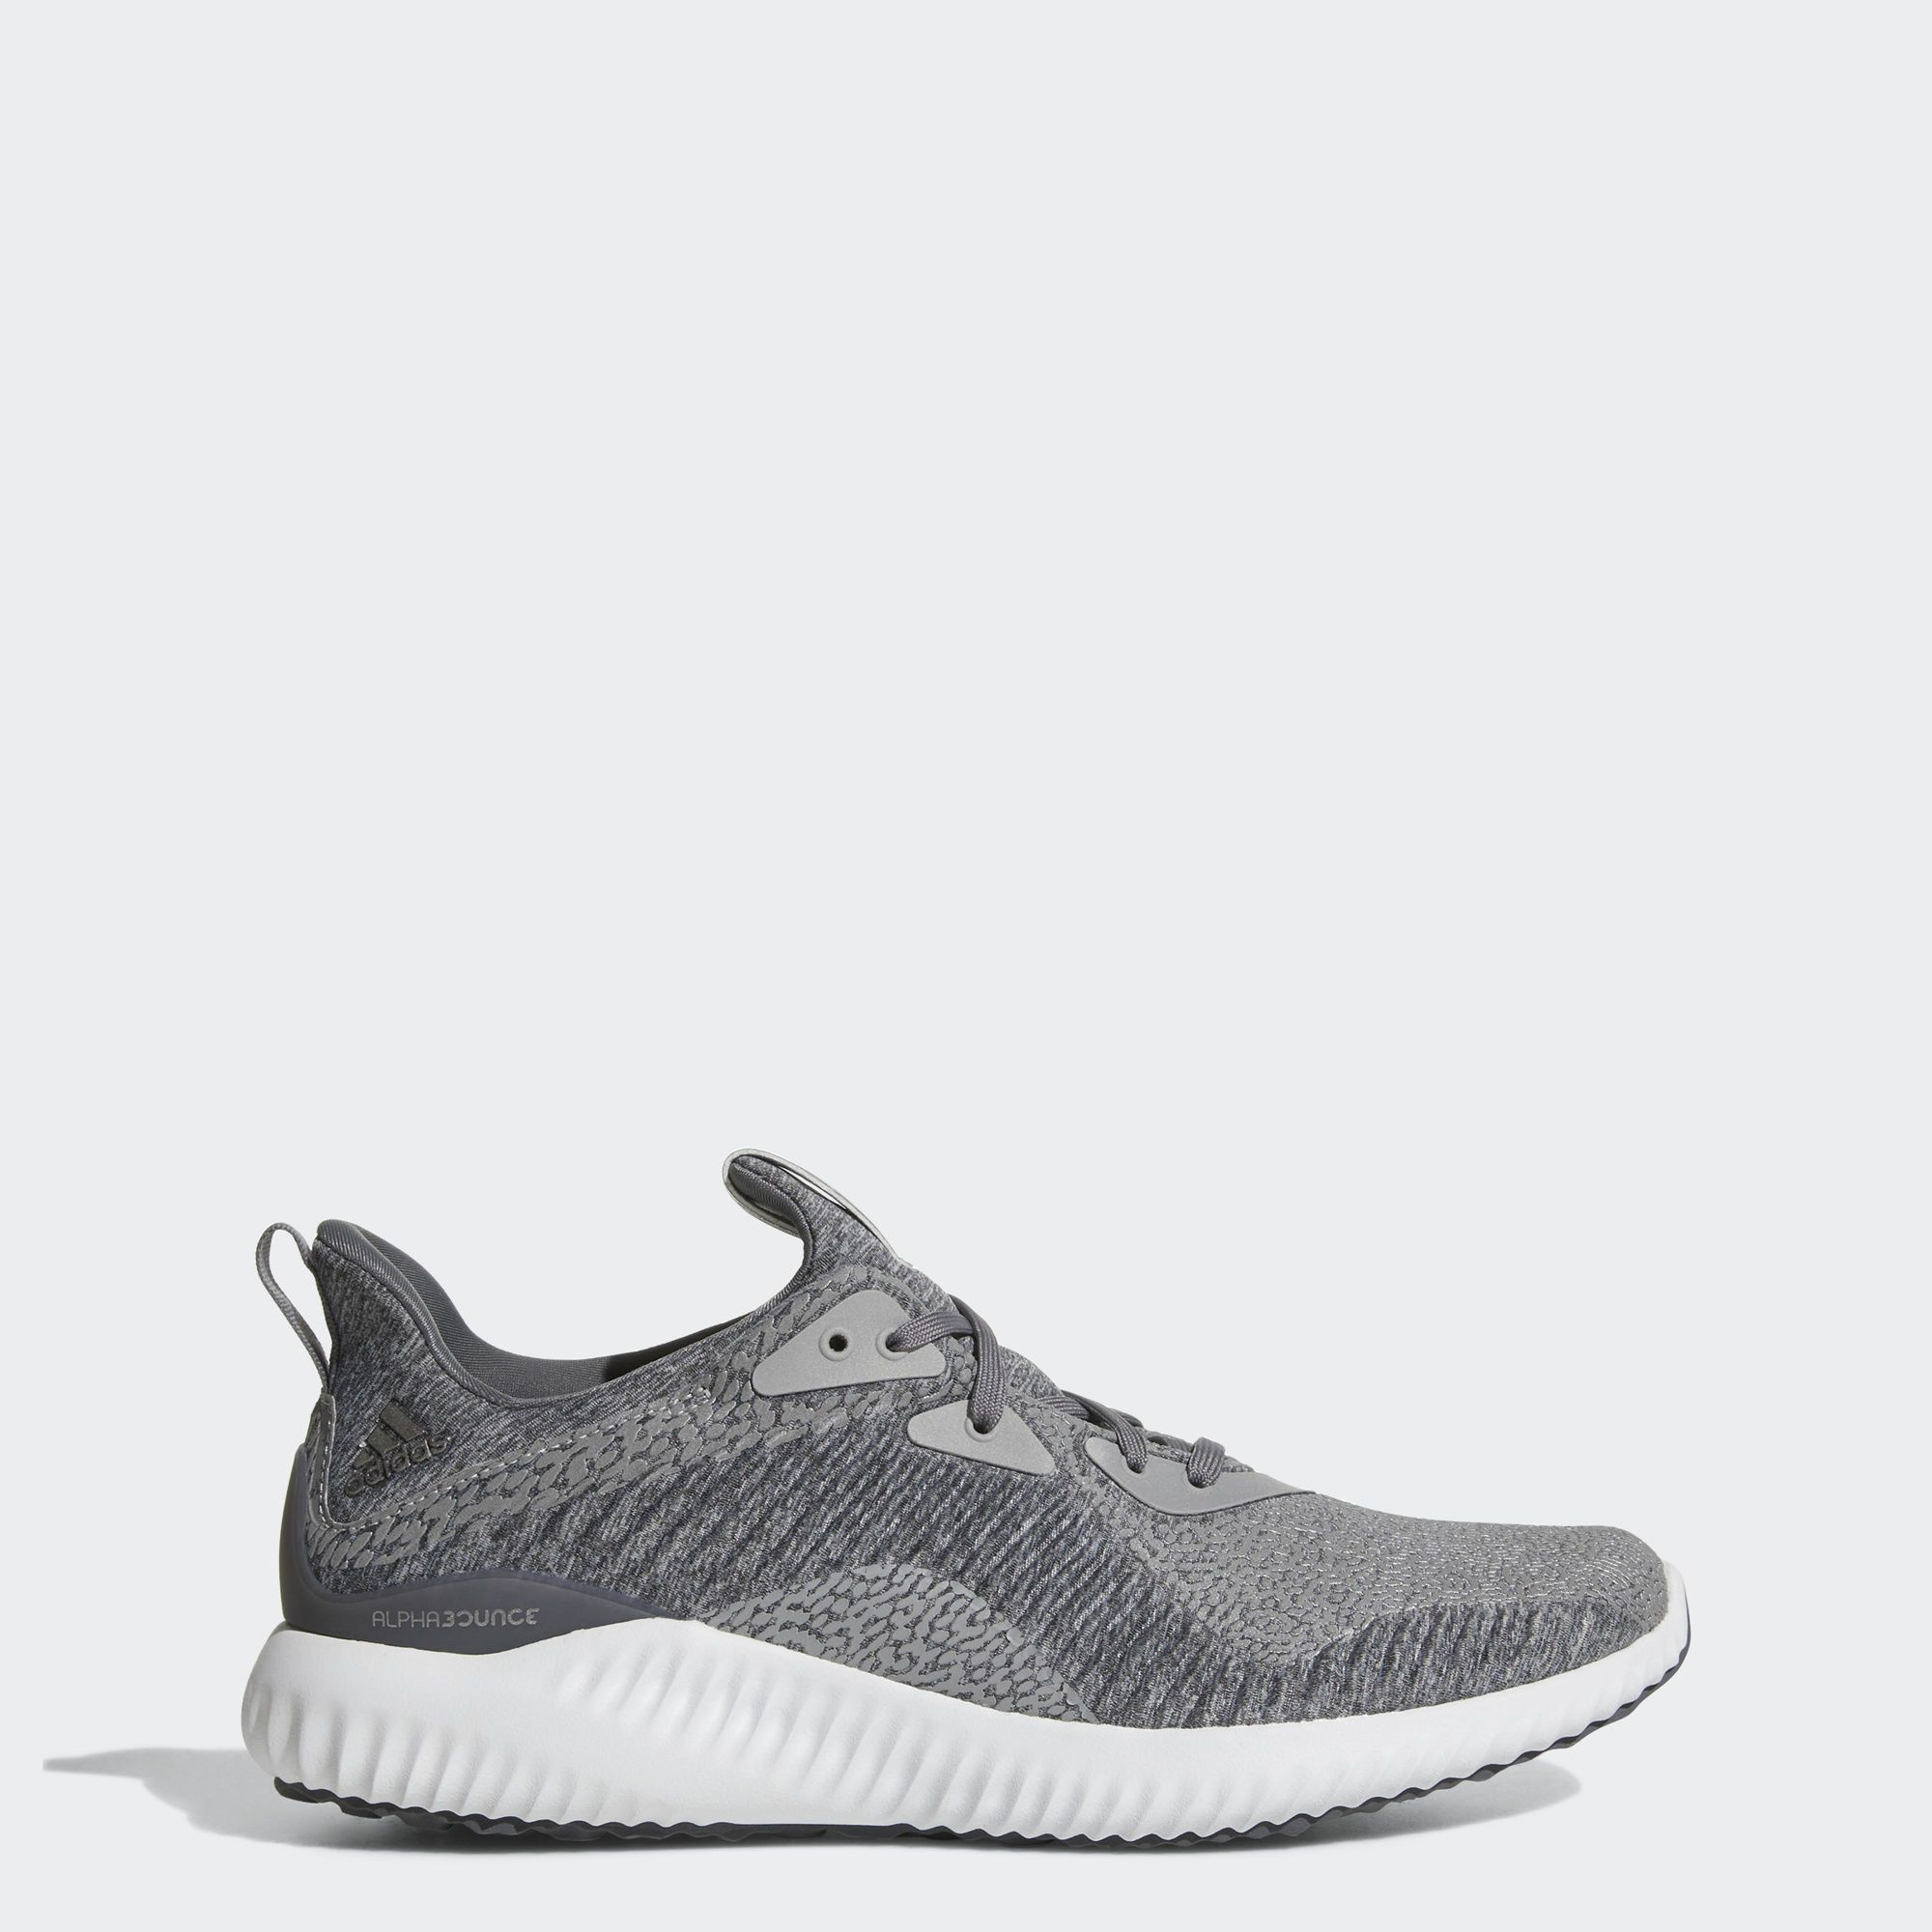 Adidas alphabounce uomini riflettente hpc ams scarpe uomini alphabounce pinterest b4b999